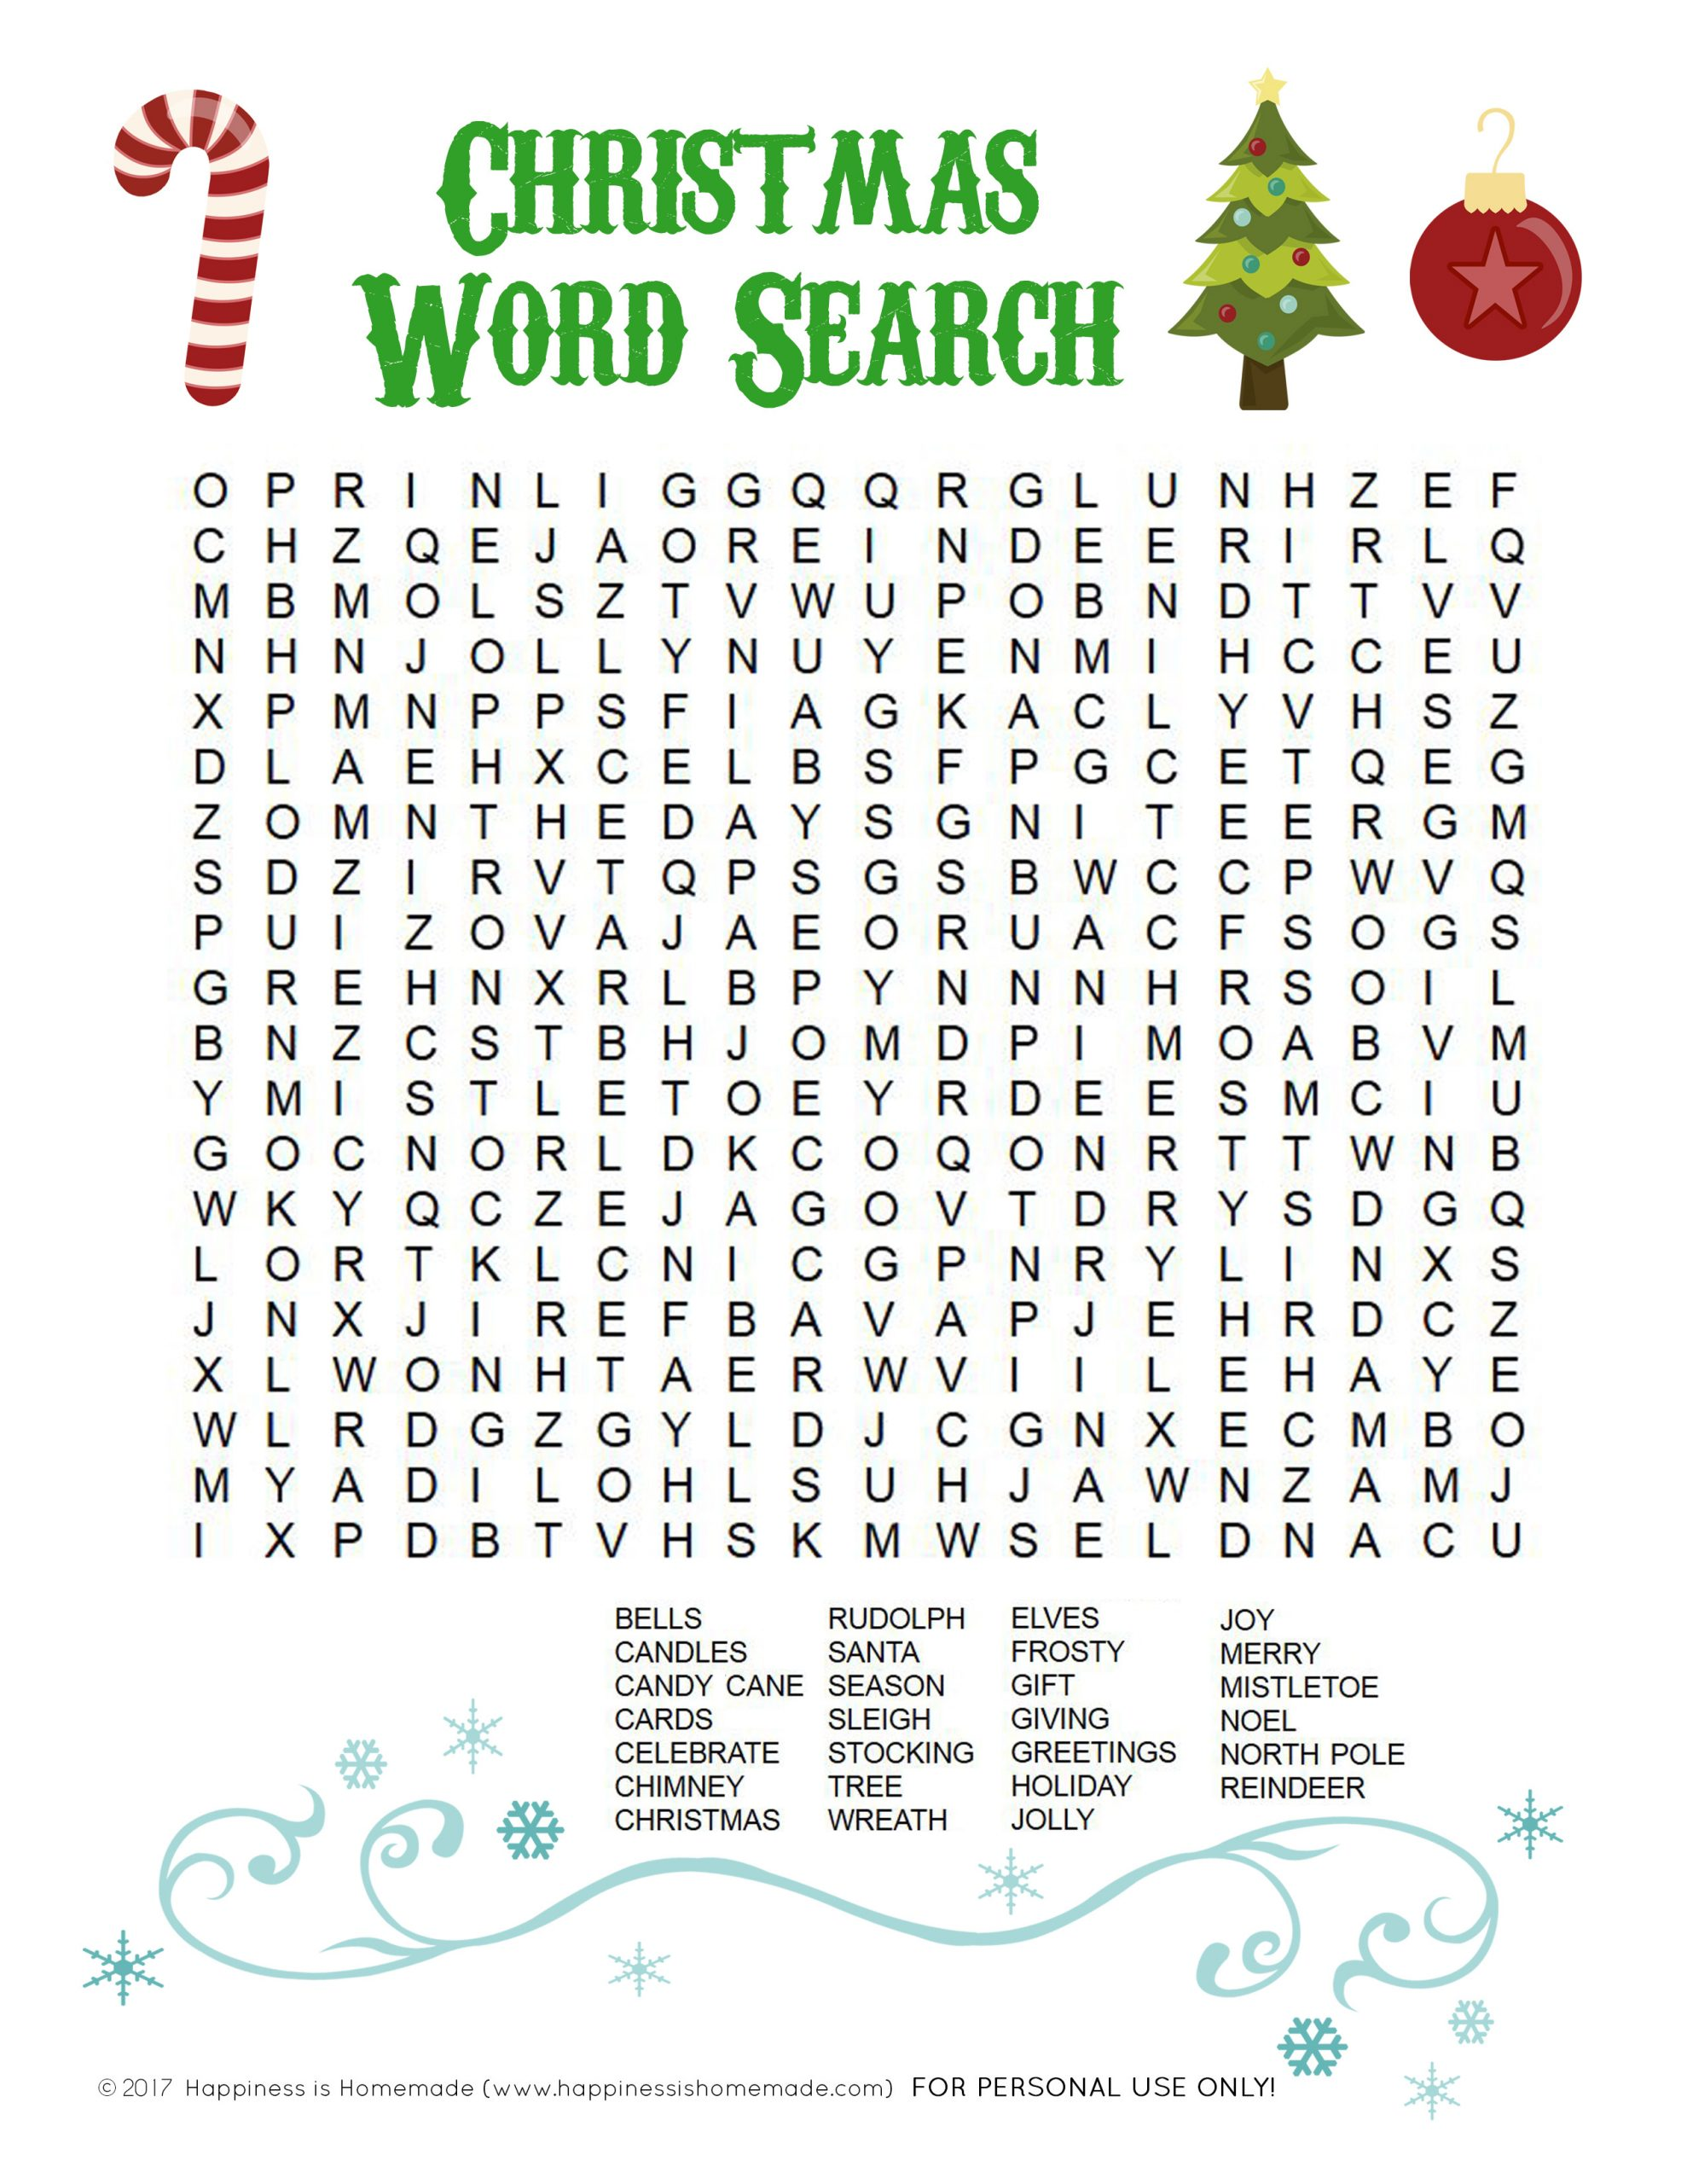 Printable Christmas Word Search For Kids & Adults